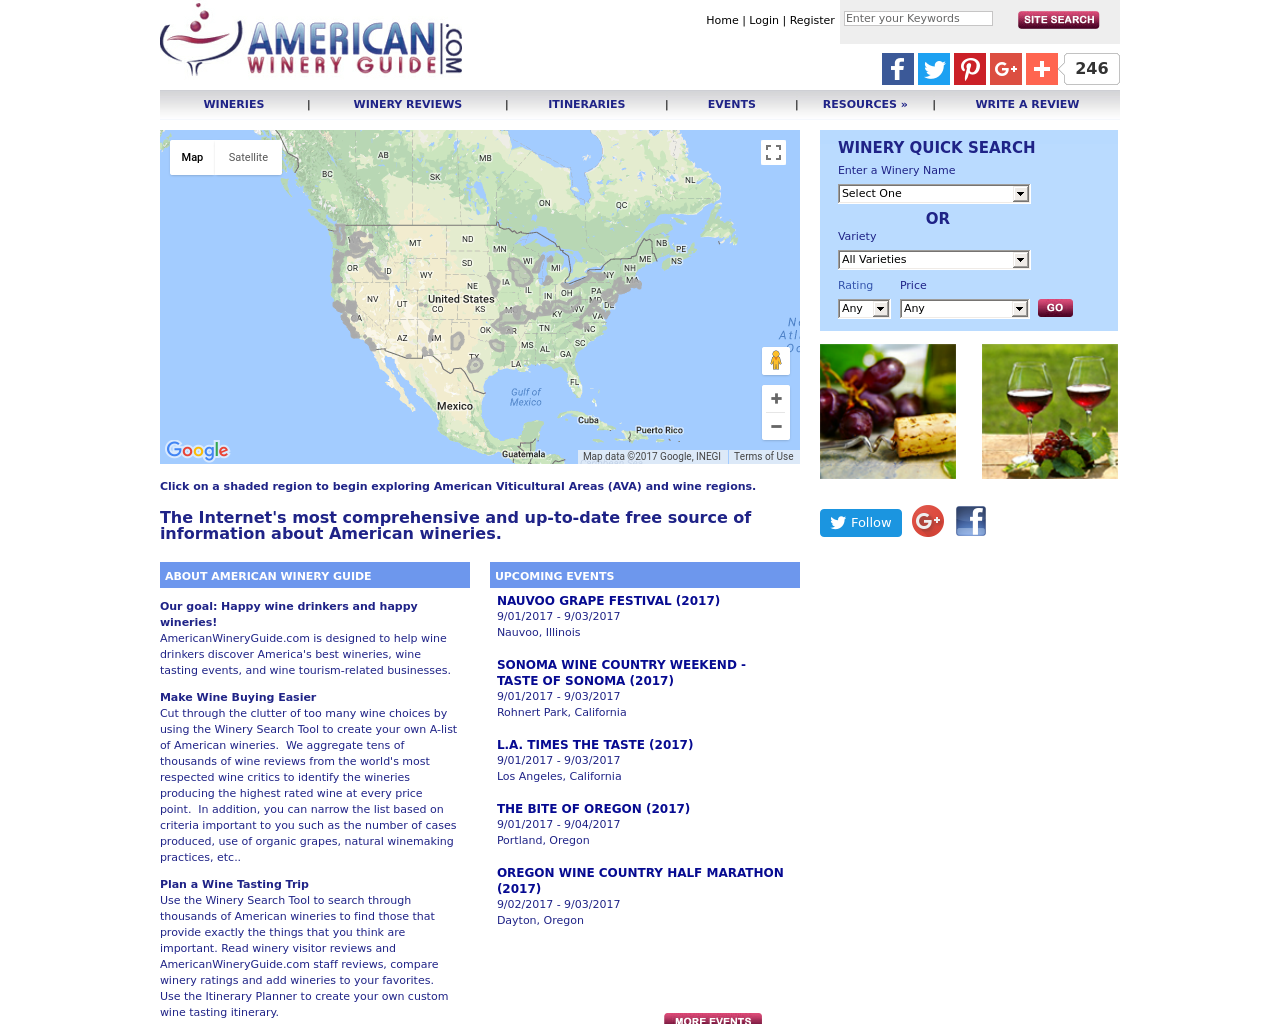 AmericanWineryGuide.com-Advertising-Reviews-Pricing